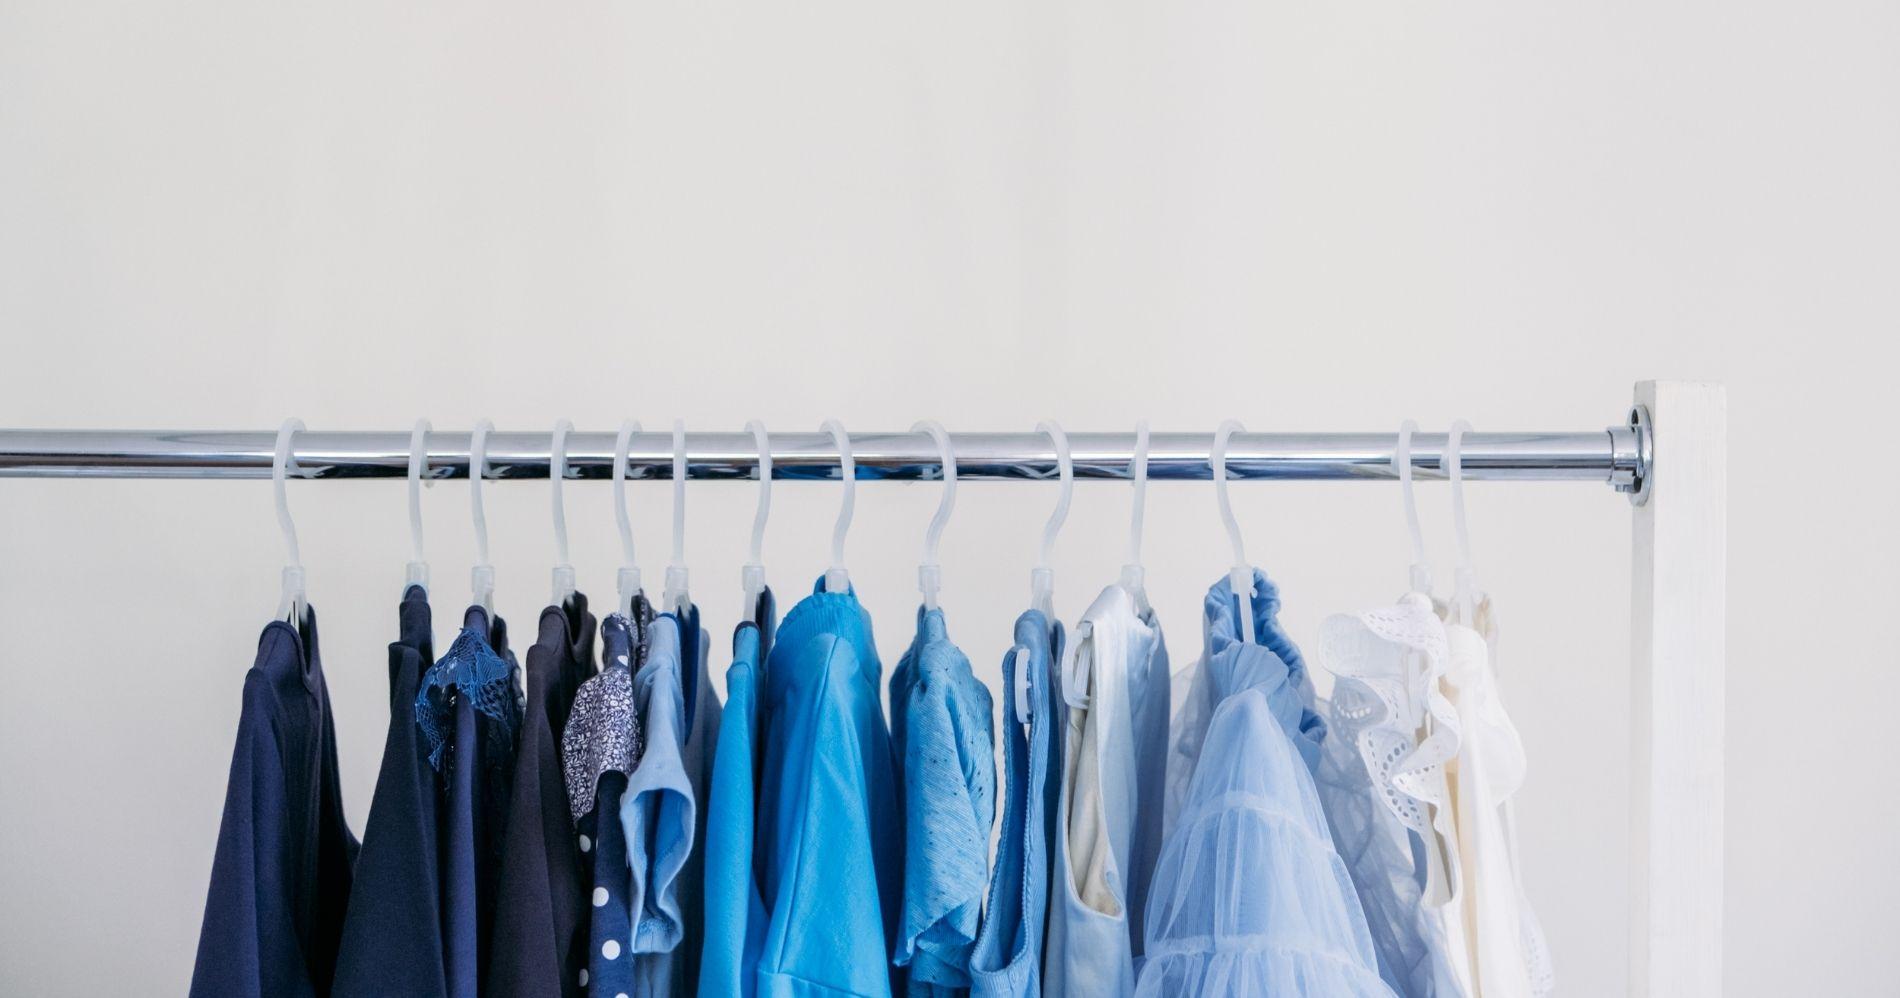 Sustainable Fashion Illustration Web Bisnis Muda - Canva